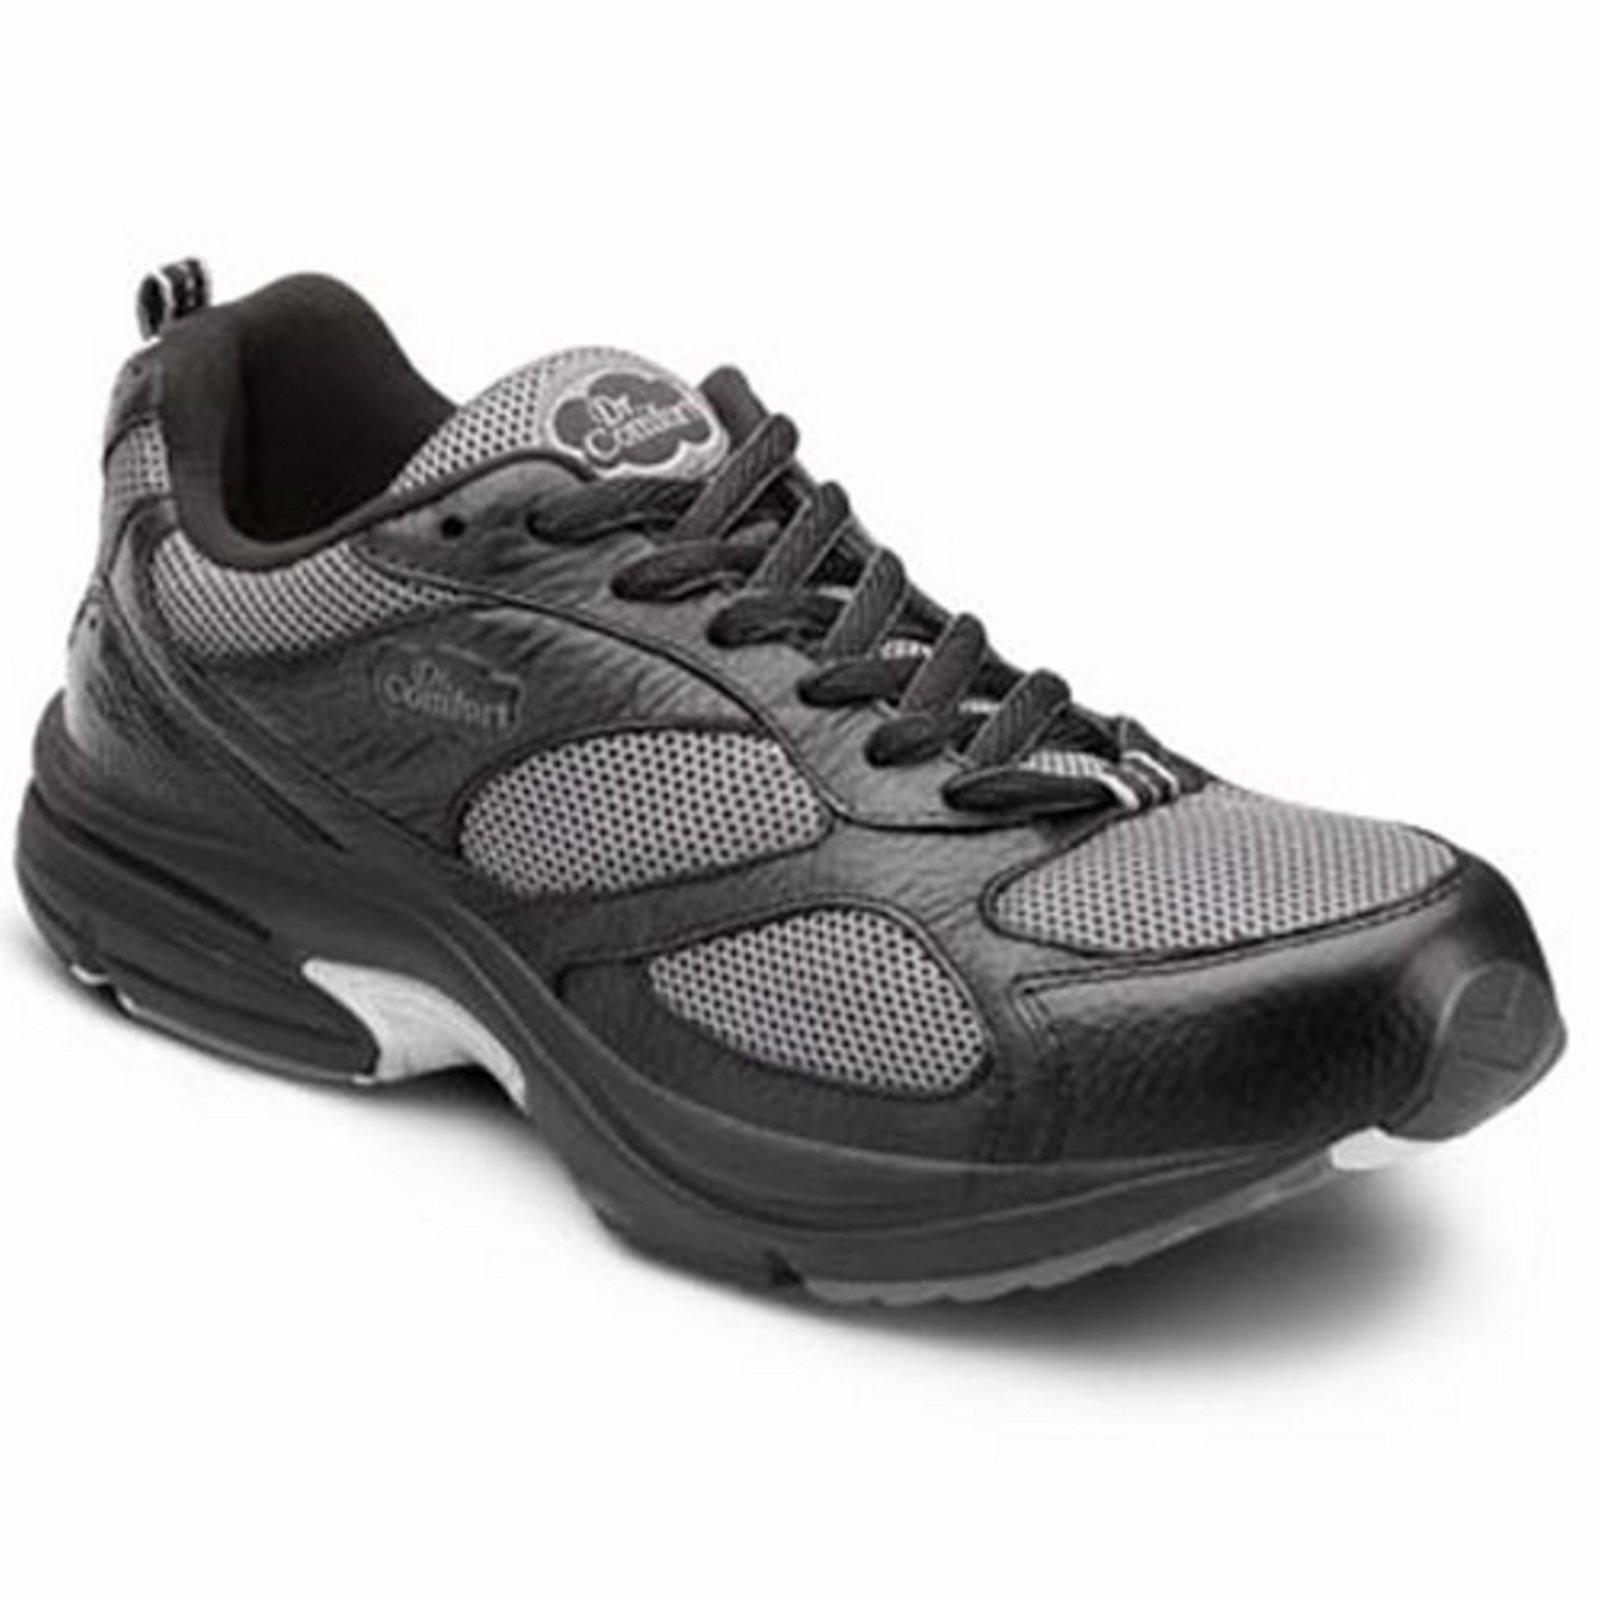 Dr. Comfort Endurance Plus Men's Therapeutic Diabetic Extra Depth Shoe: Black 12 Medium (B/D) Lace